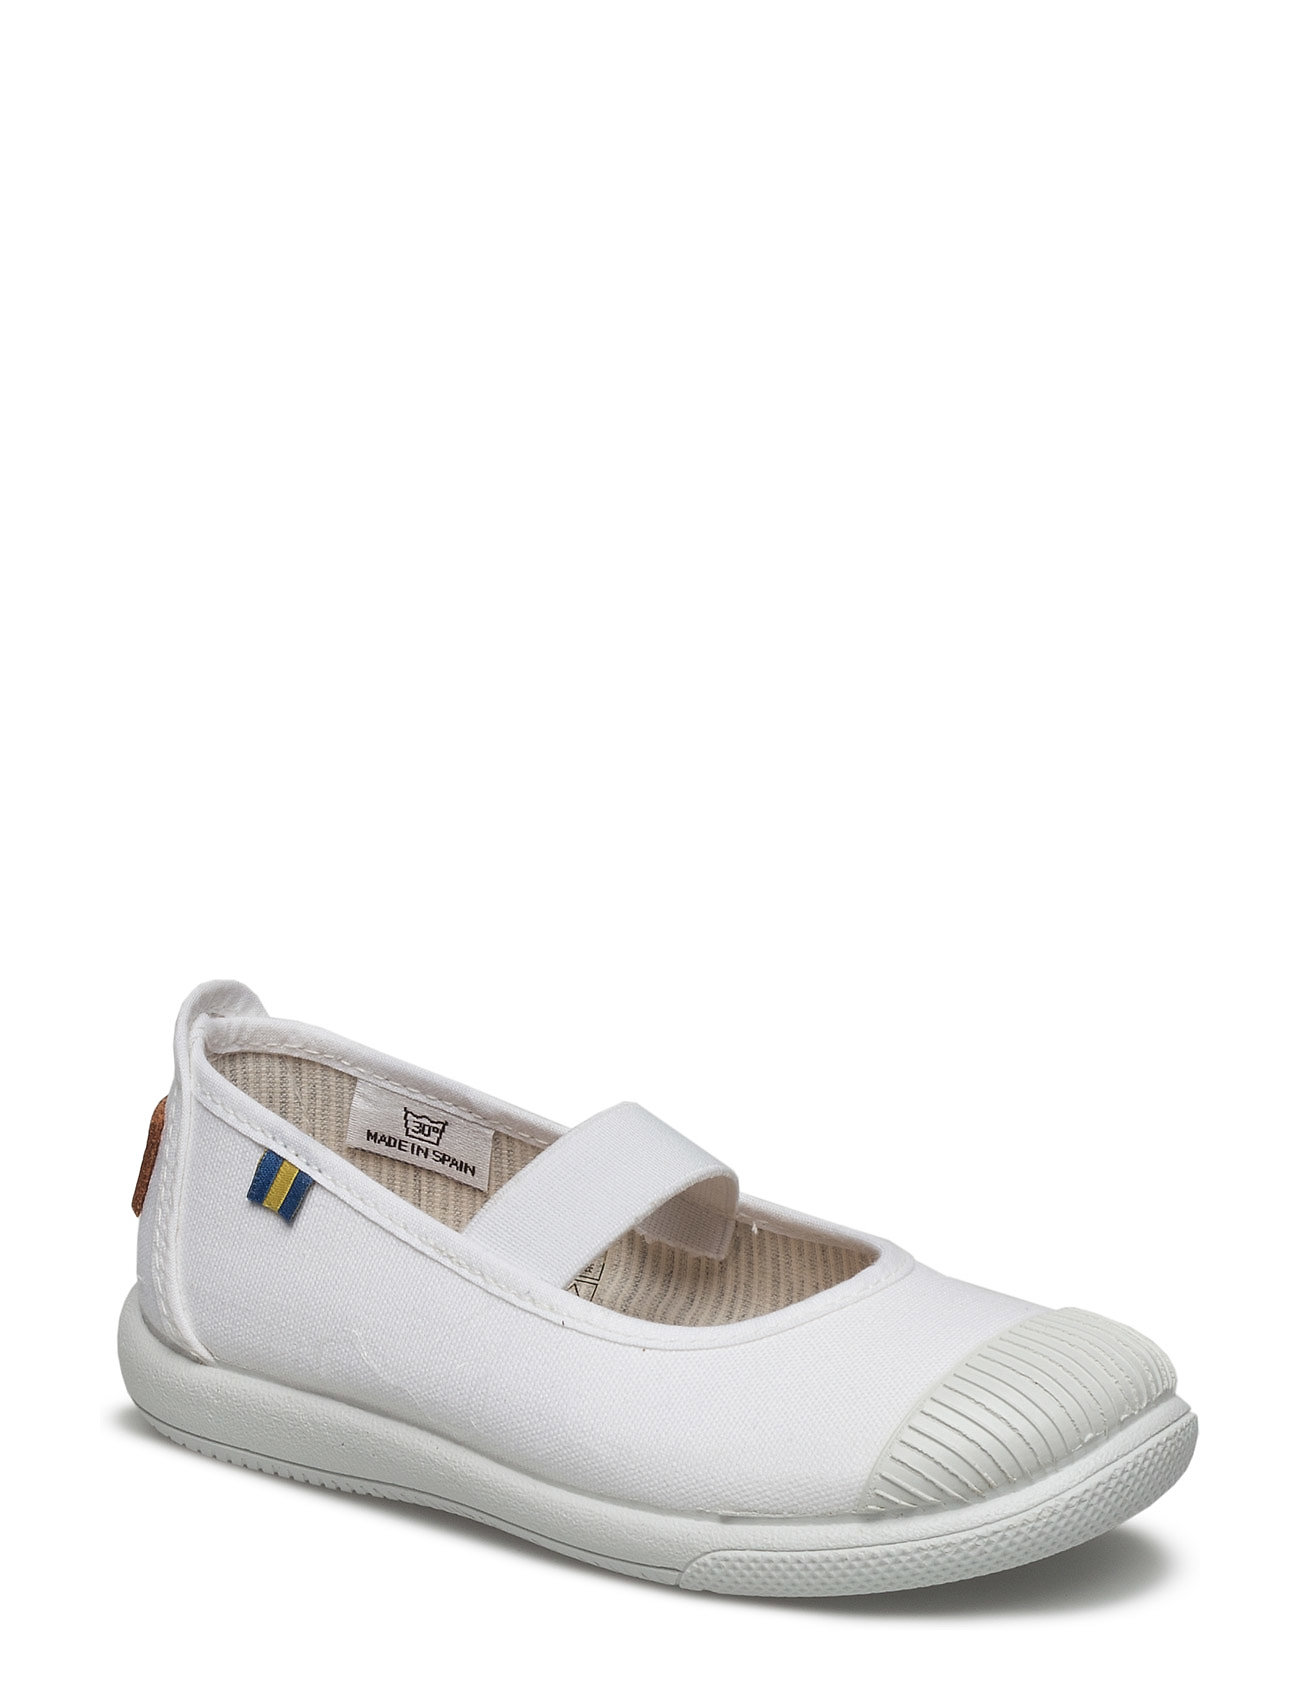 kavat Stockamã¶llan tx canvas shoe på boozt.com dk